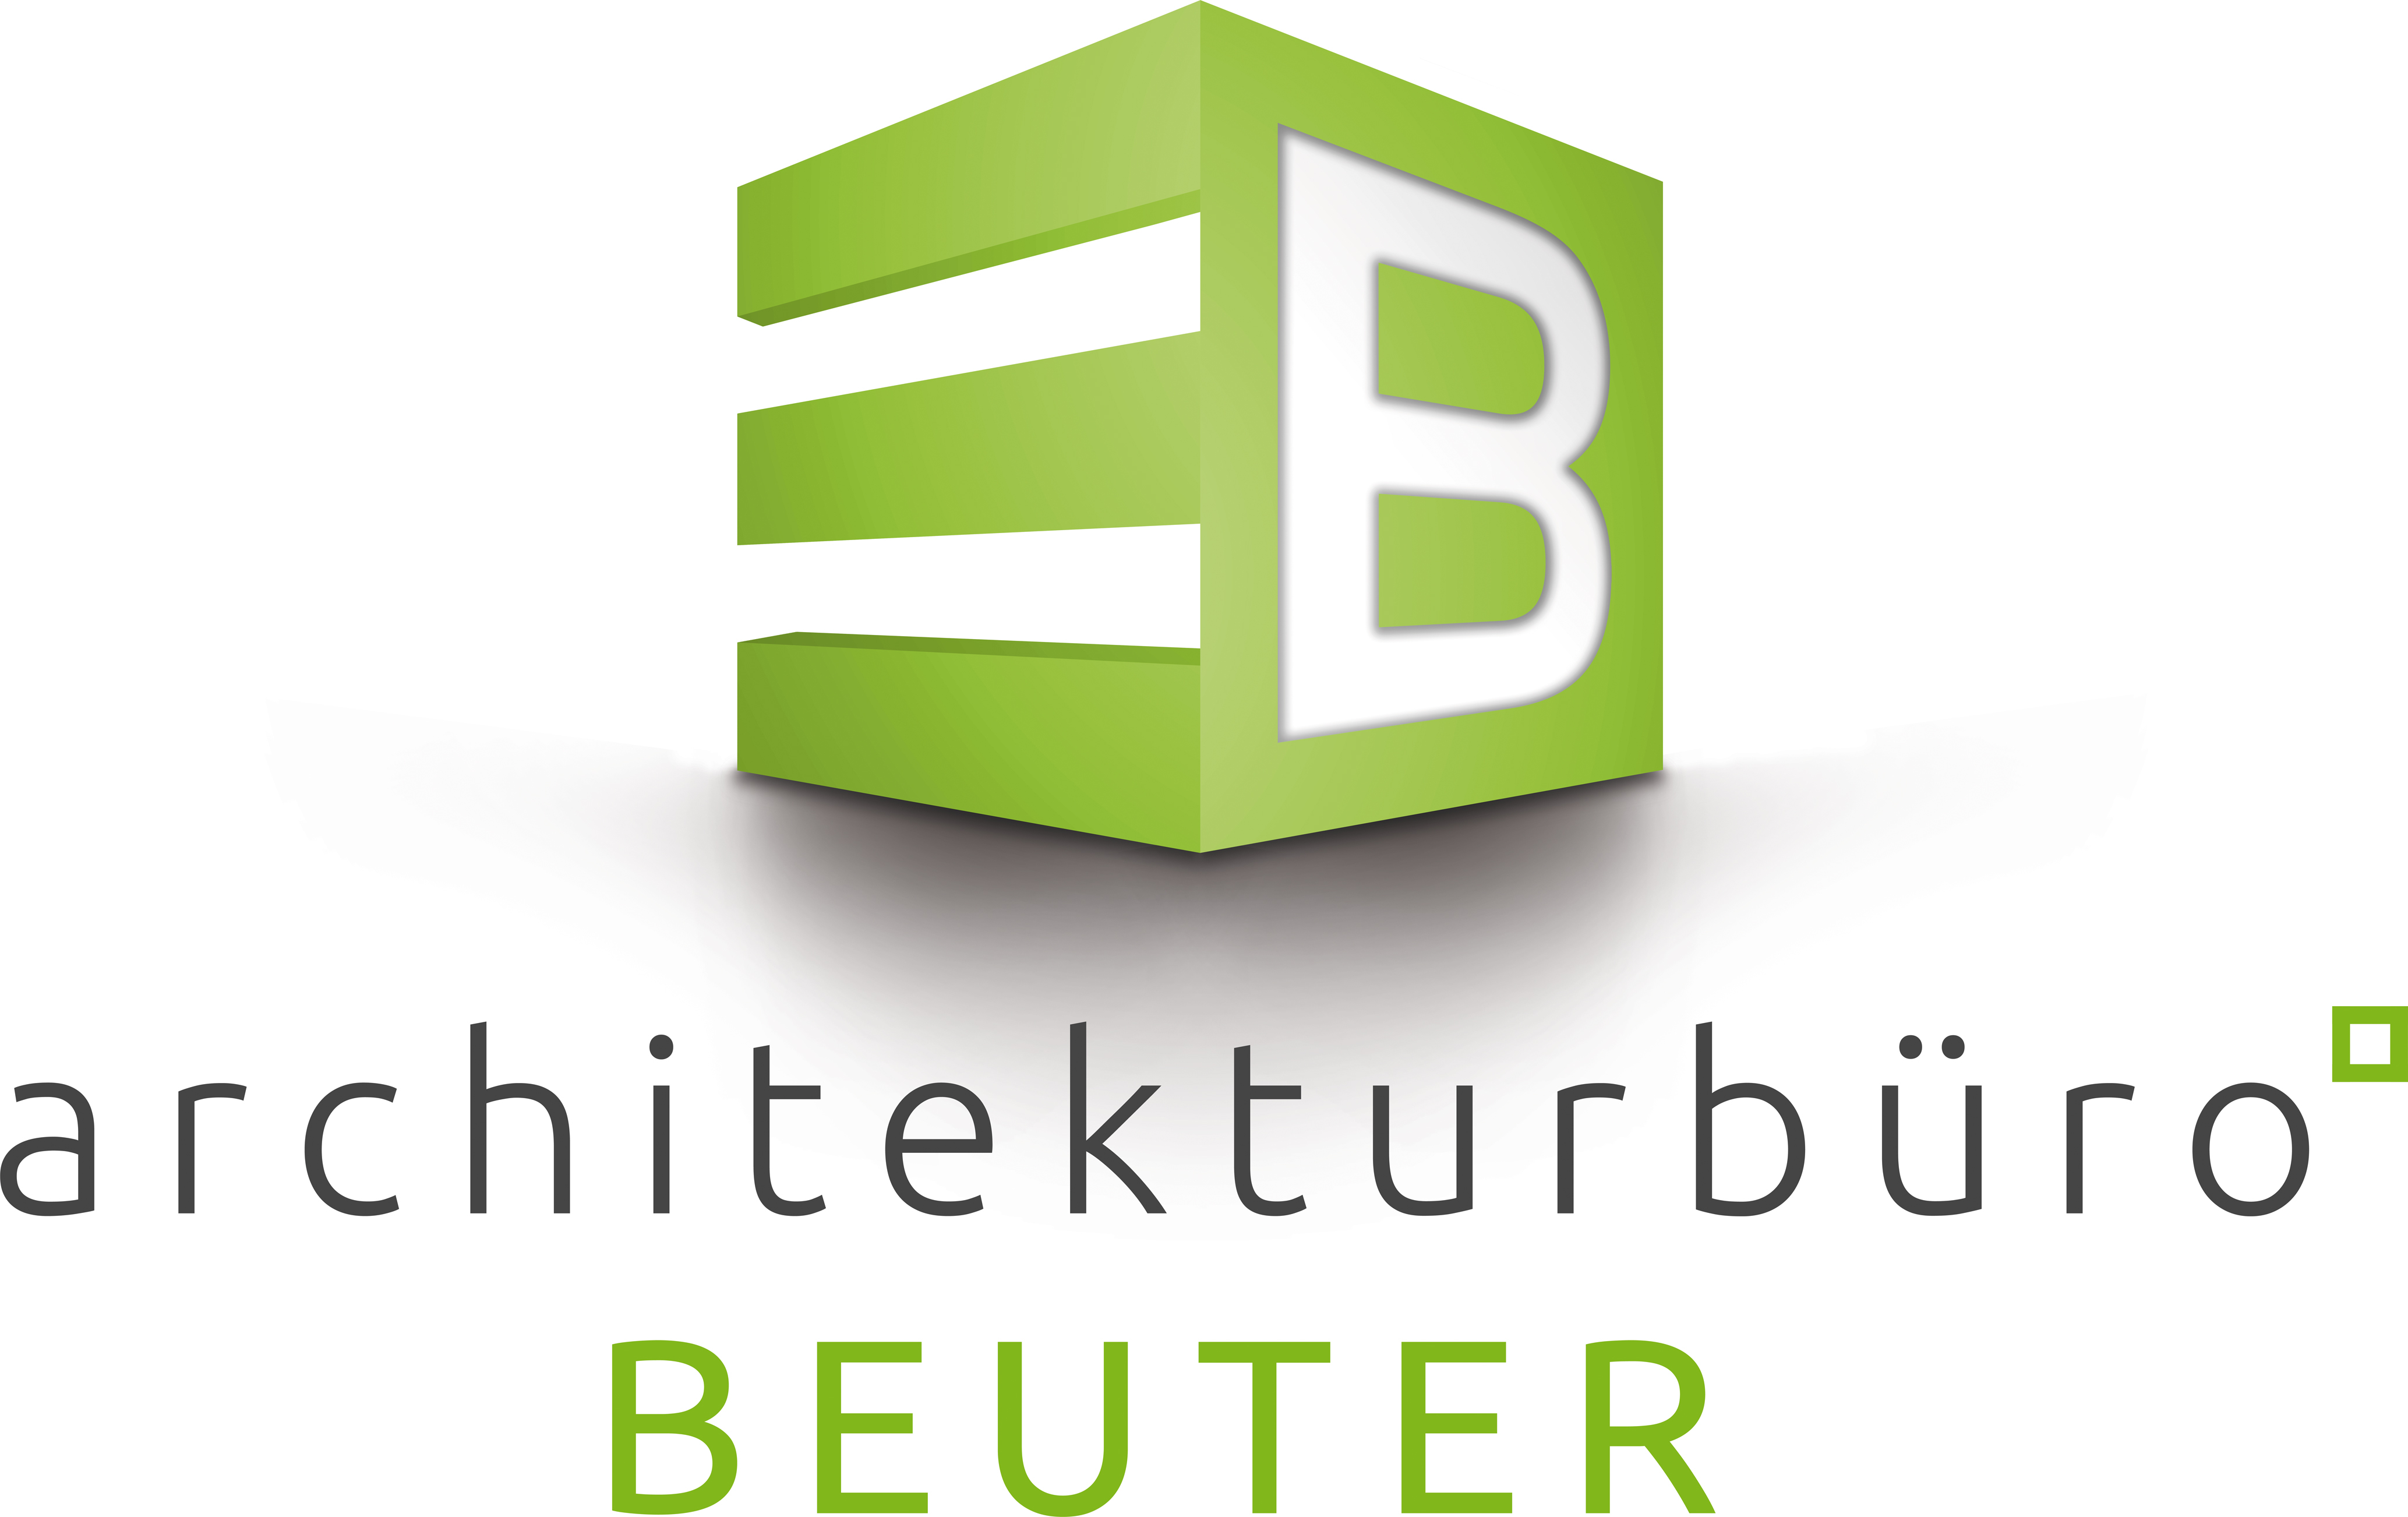 Architekturbüro Beuter